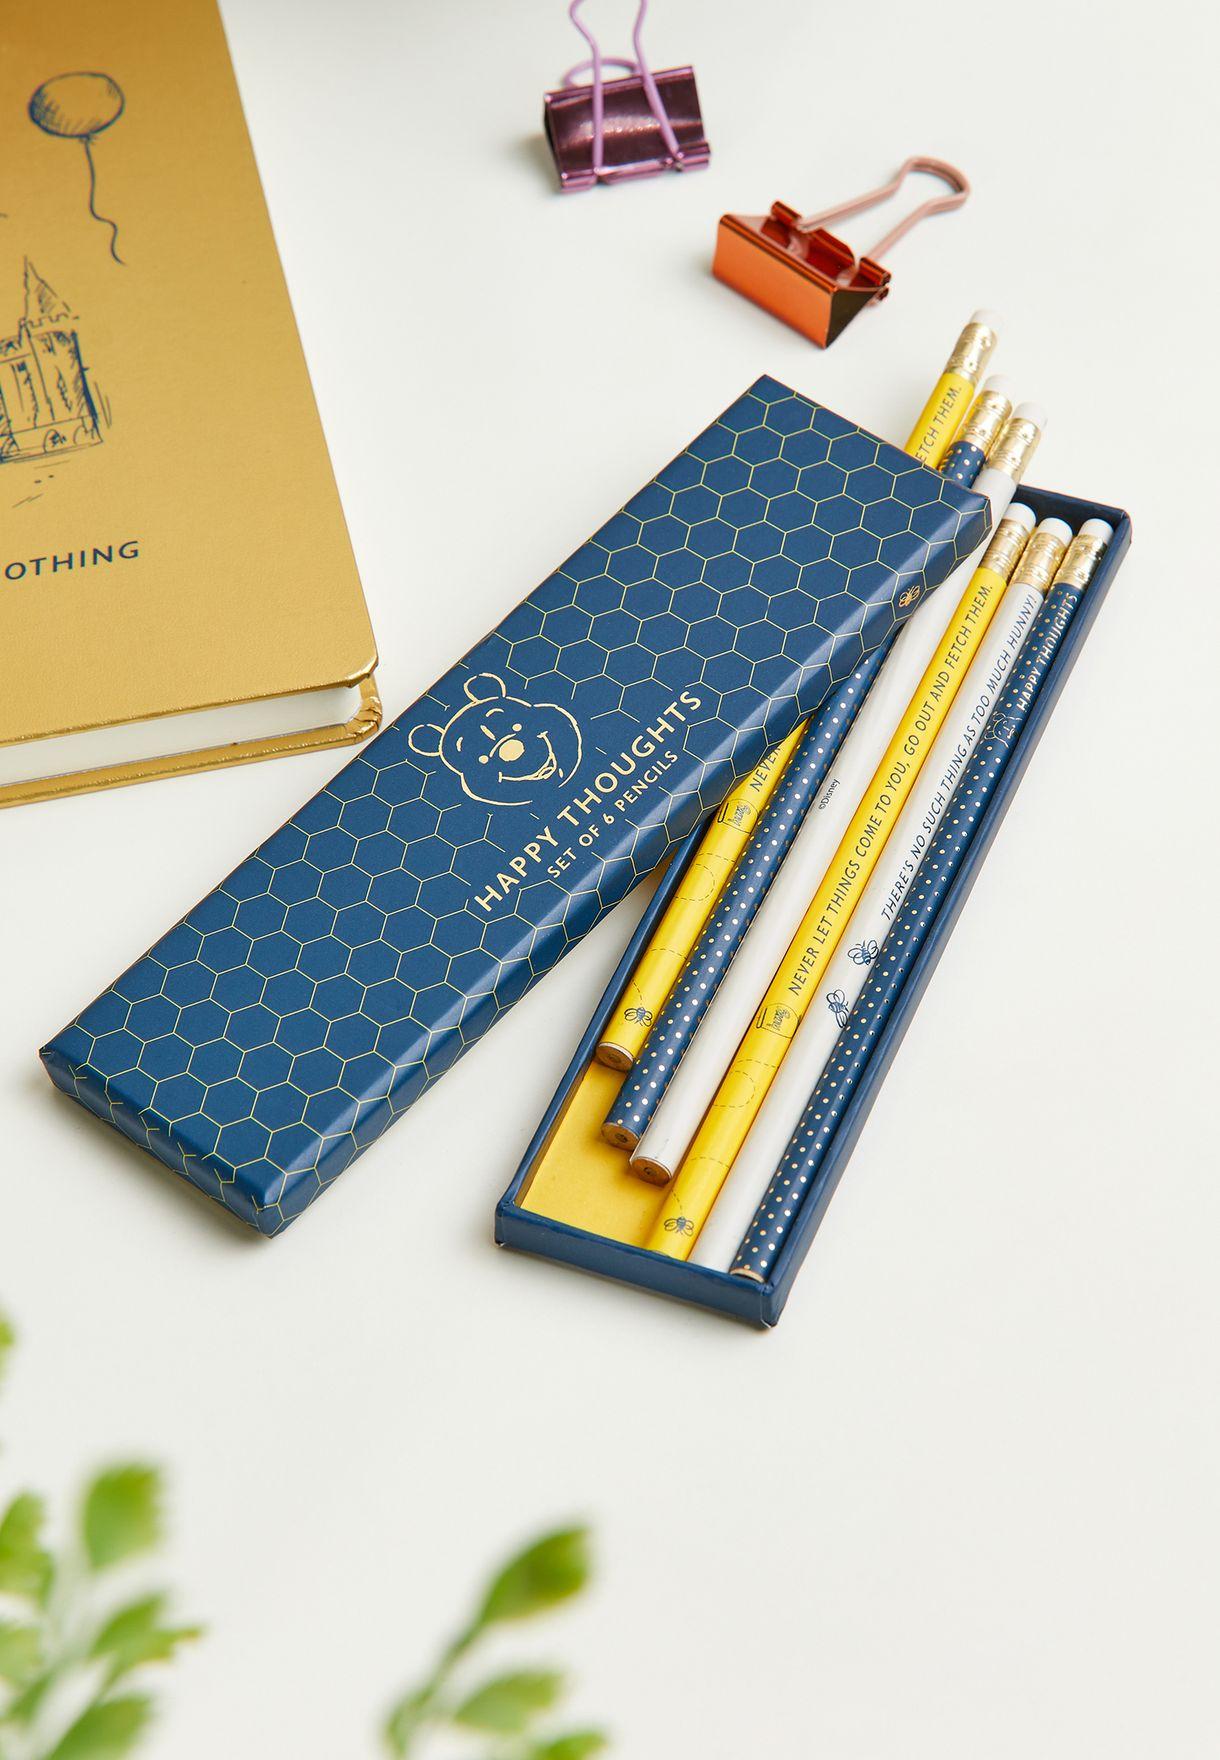 Set Of 6 Winnie The Pooh Pencils